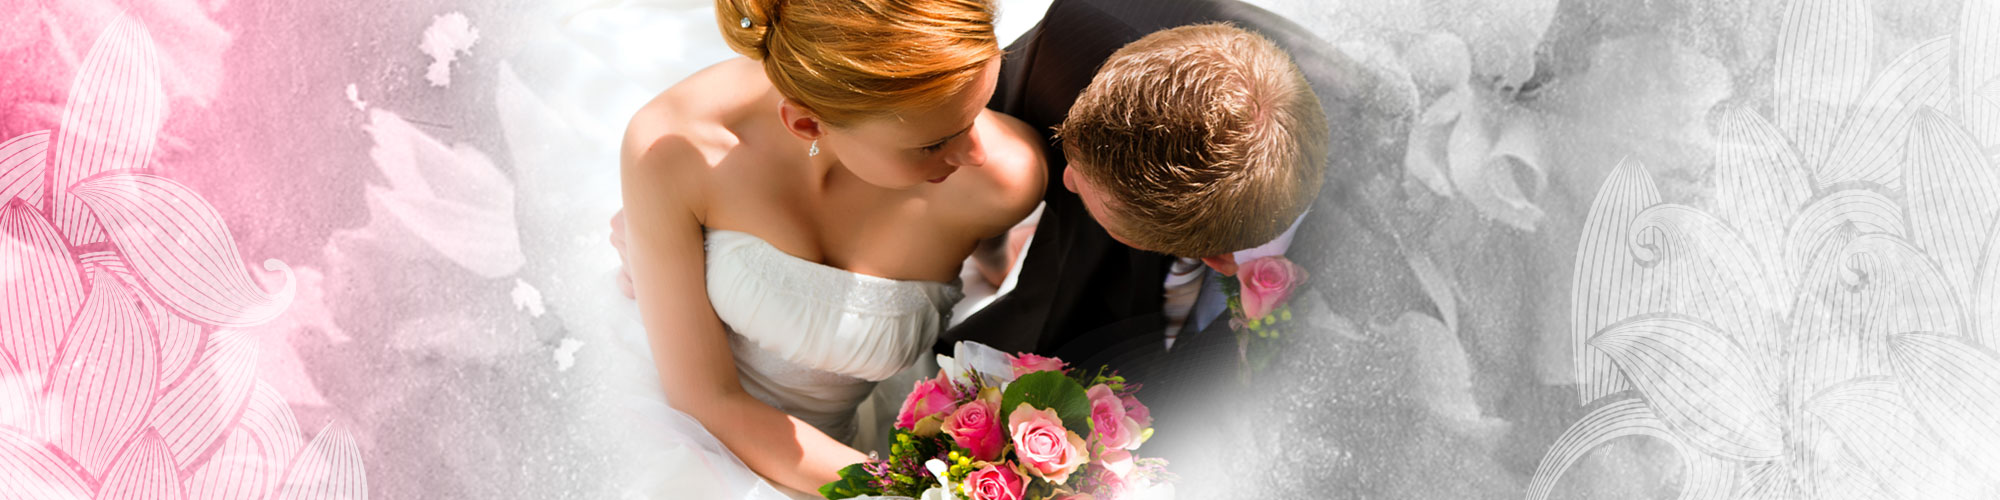 revolution_slider_mariage